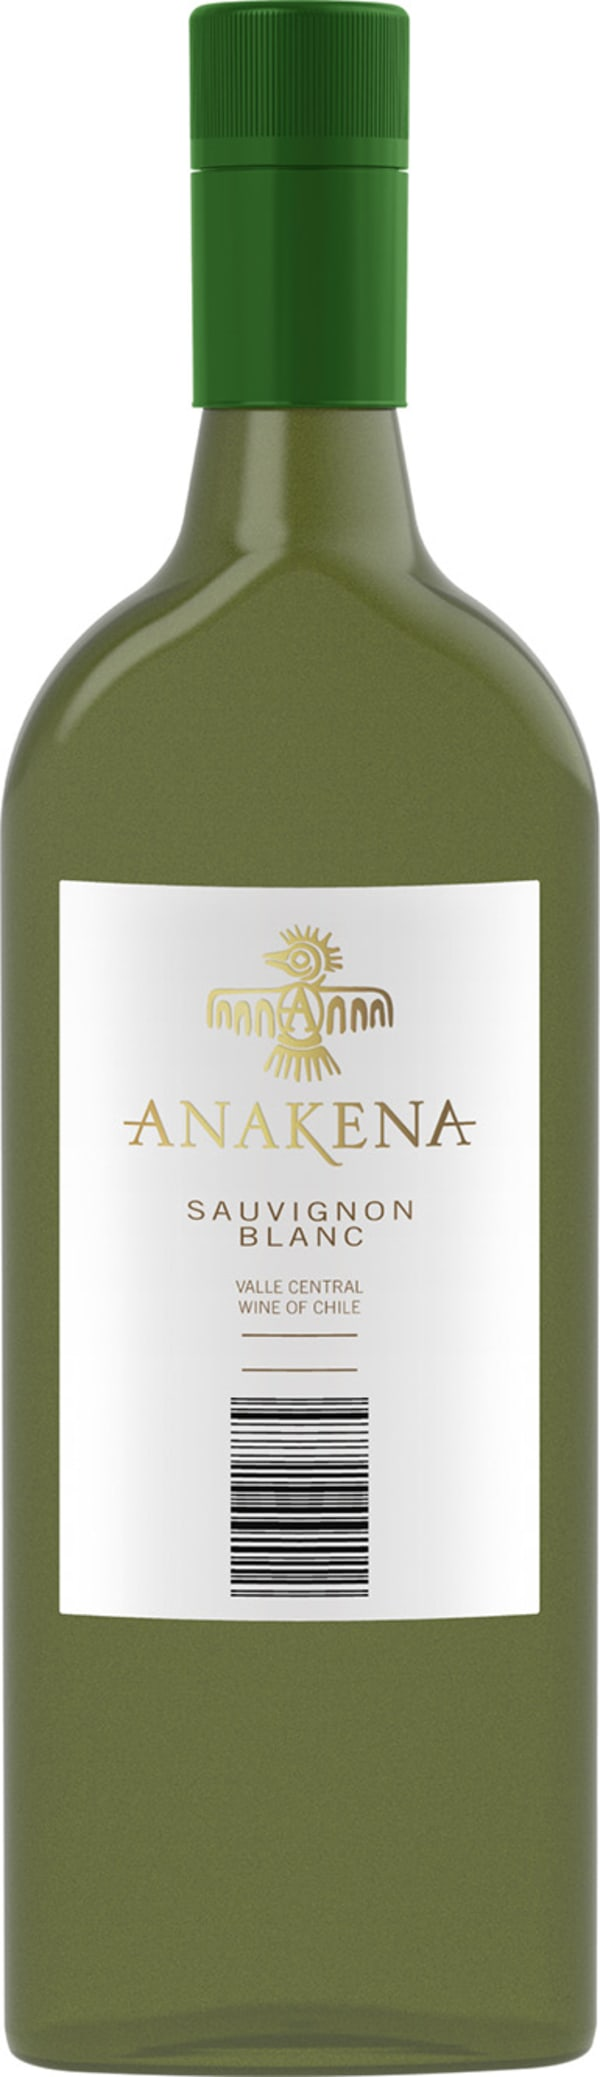 Anakena Sauvignon Blanc 2019 plastic bottle